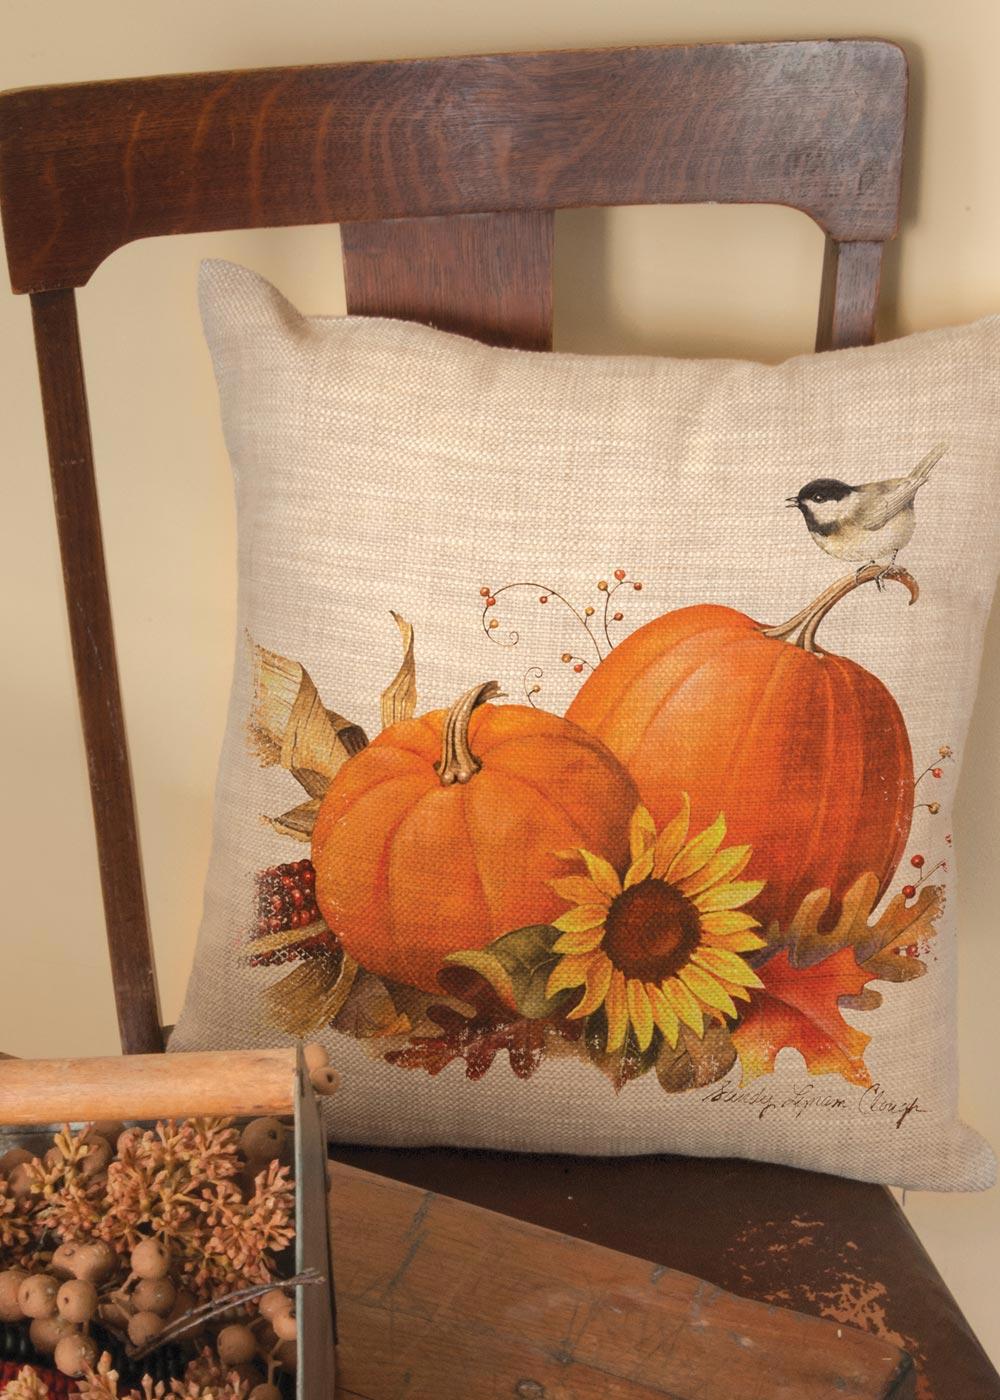 Harvest Pumpkin Pillow Cover | Heritage Lace